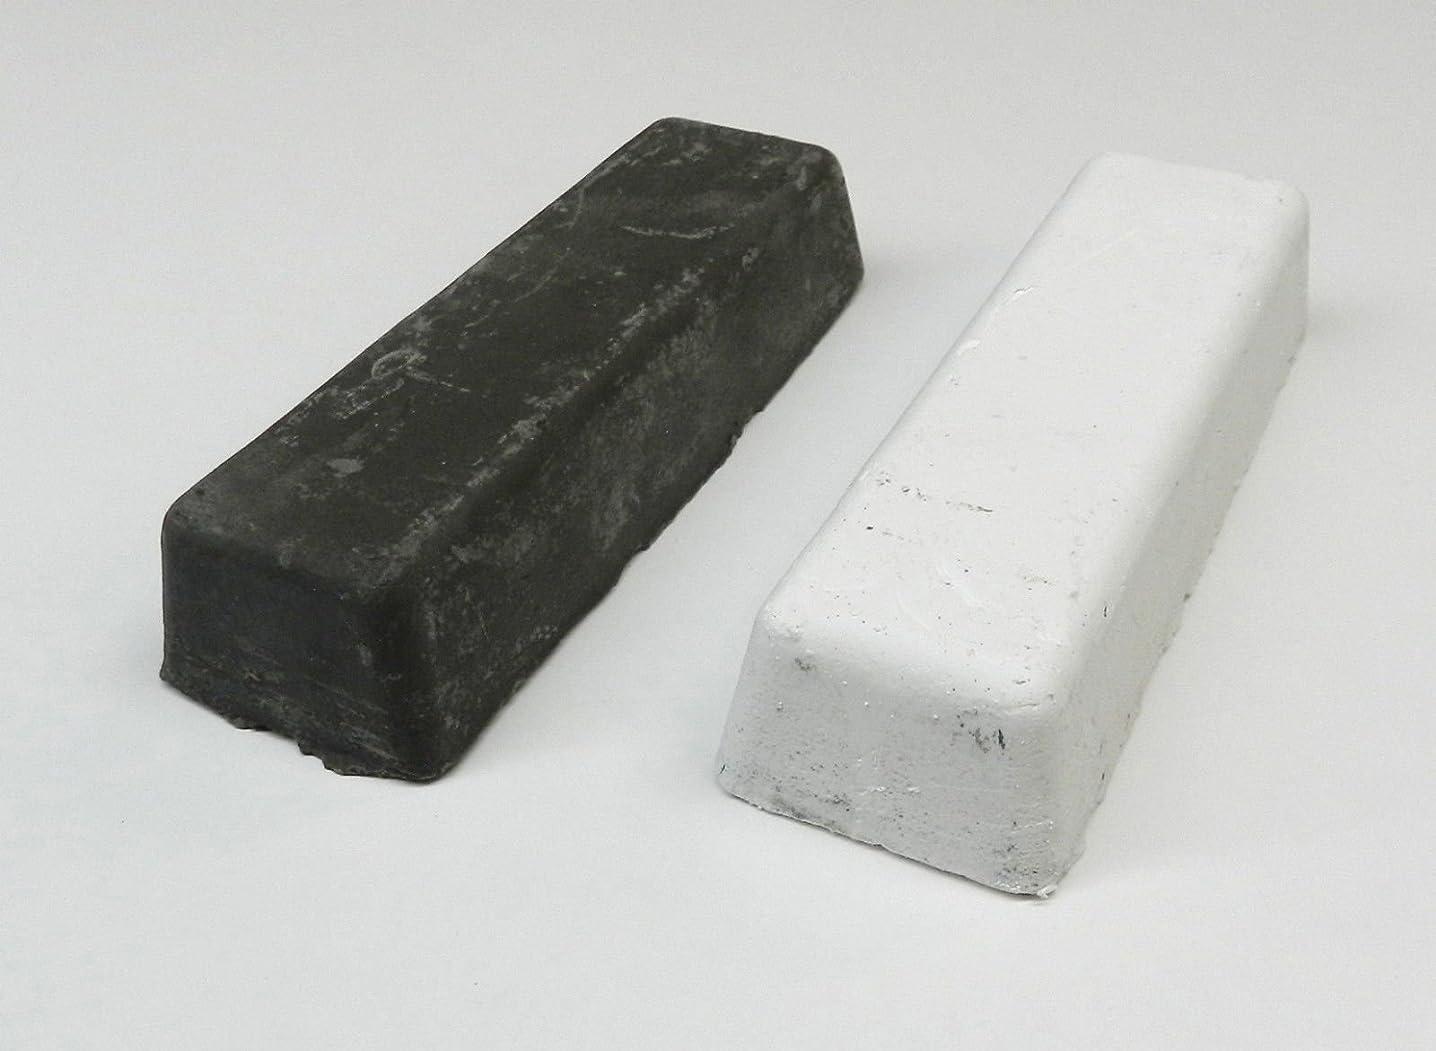 Polishing Compound White and Grey 1lb bars